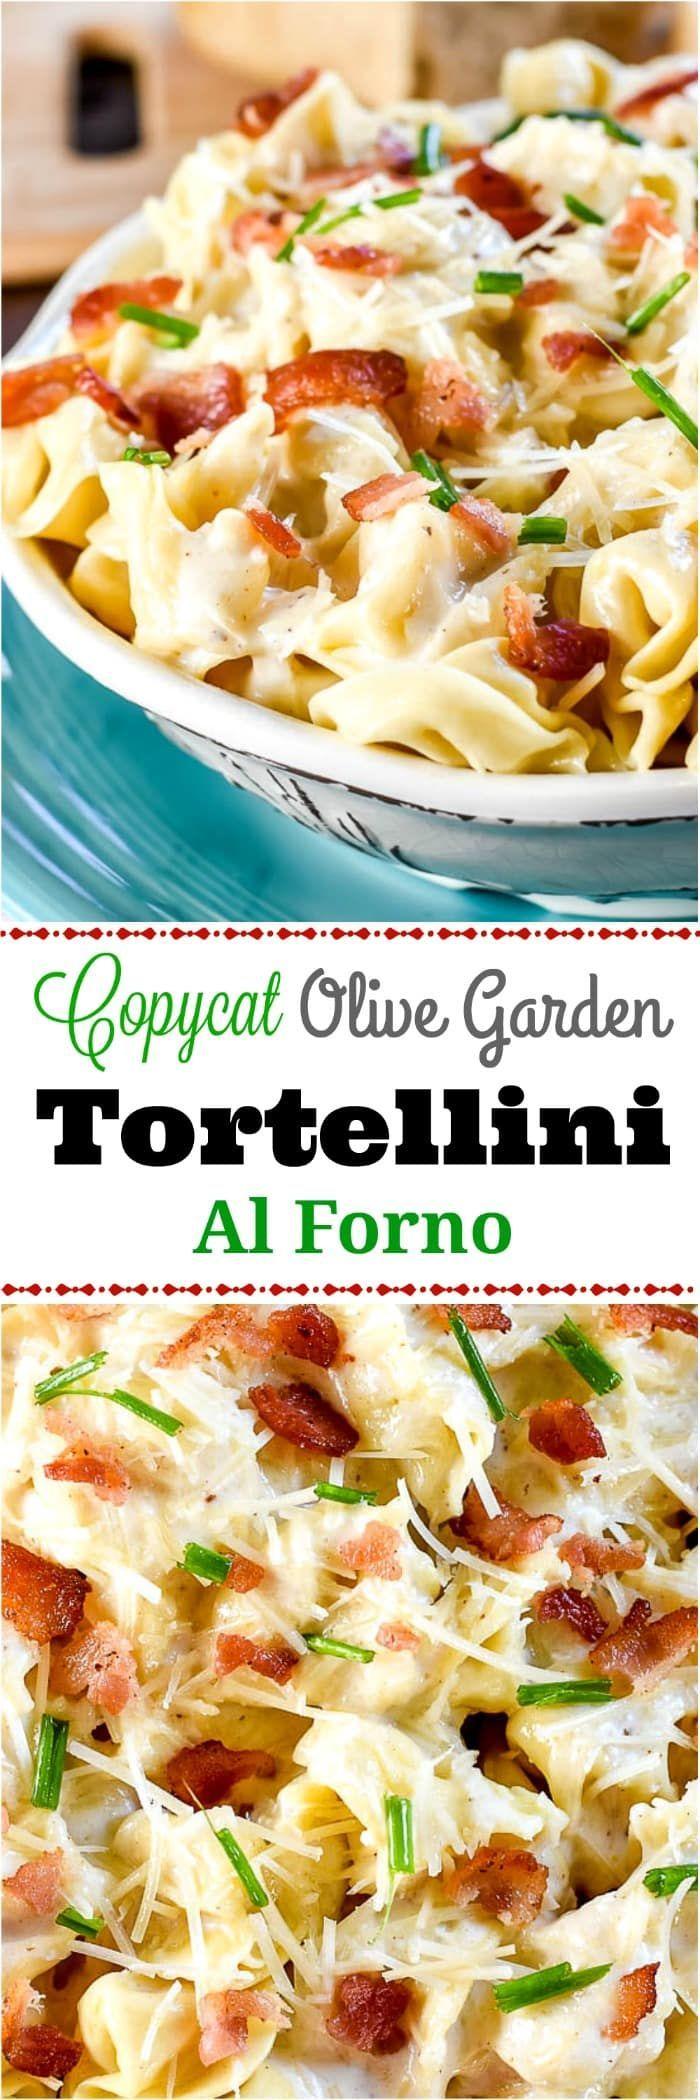 tortellini al forno a copycat olive garden recipe has pillowy cheese filled tortellini in - Tortellini Al Forno Olive Garden